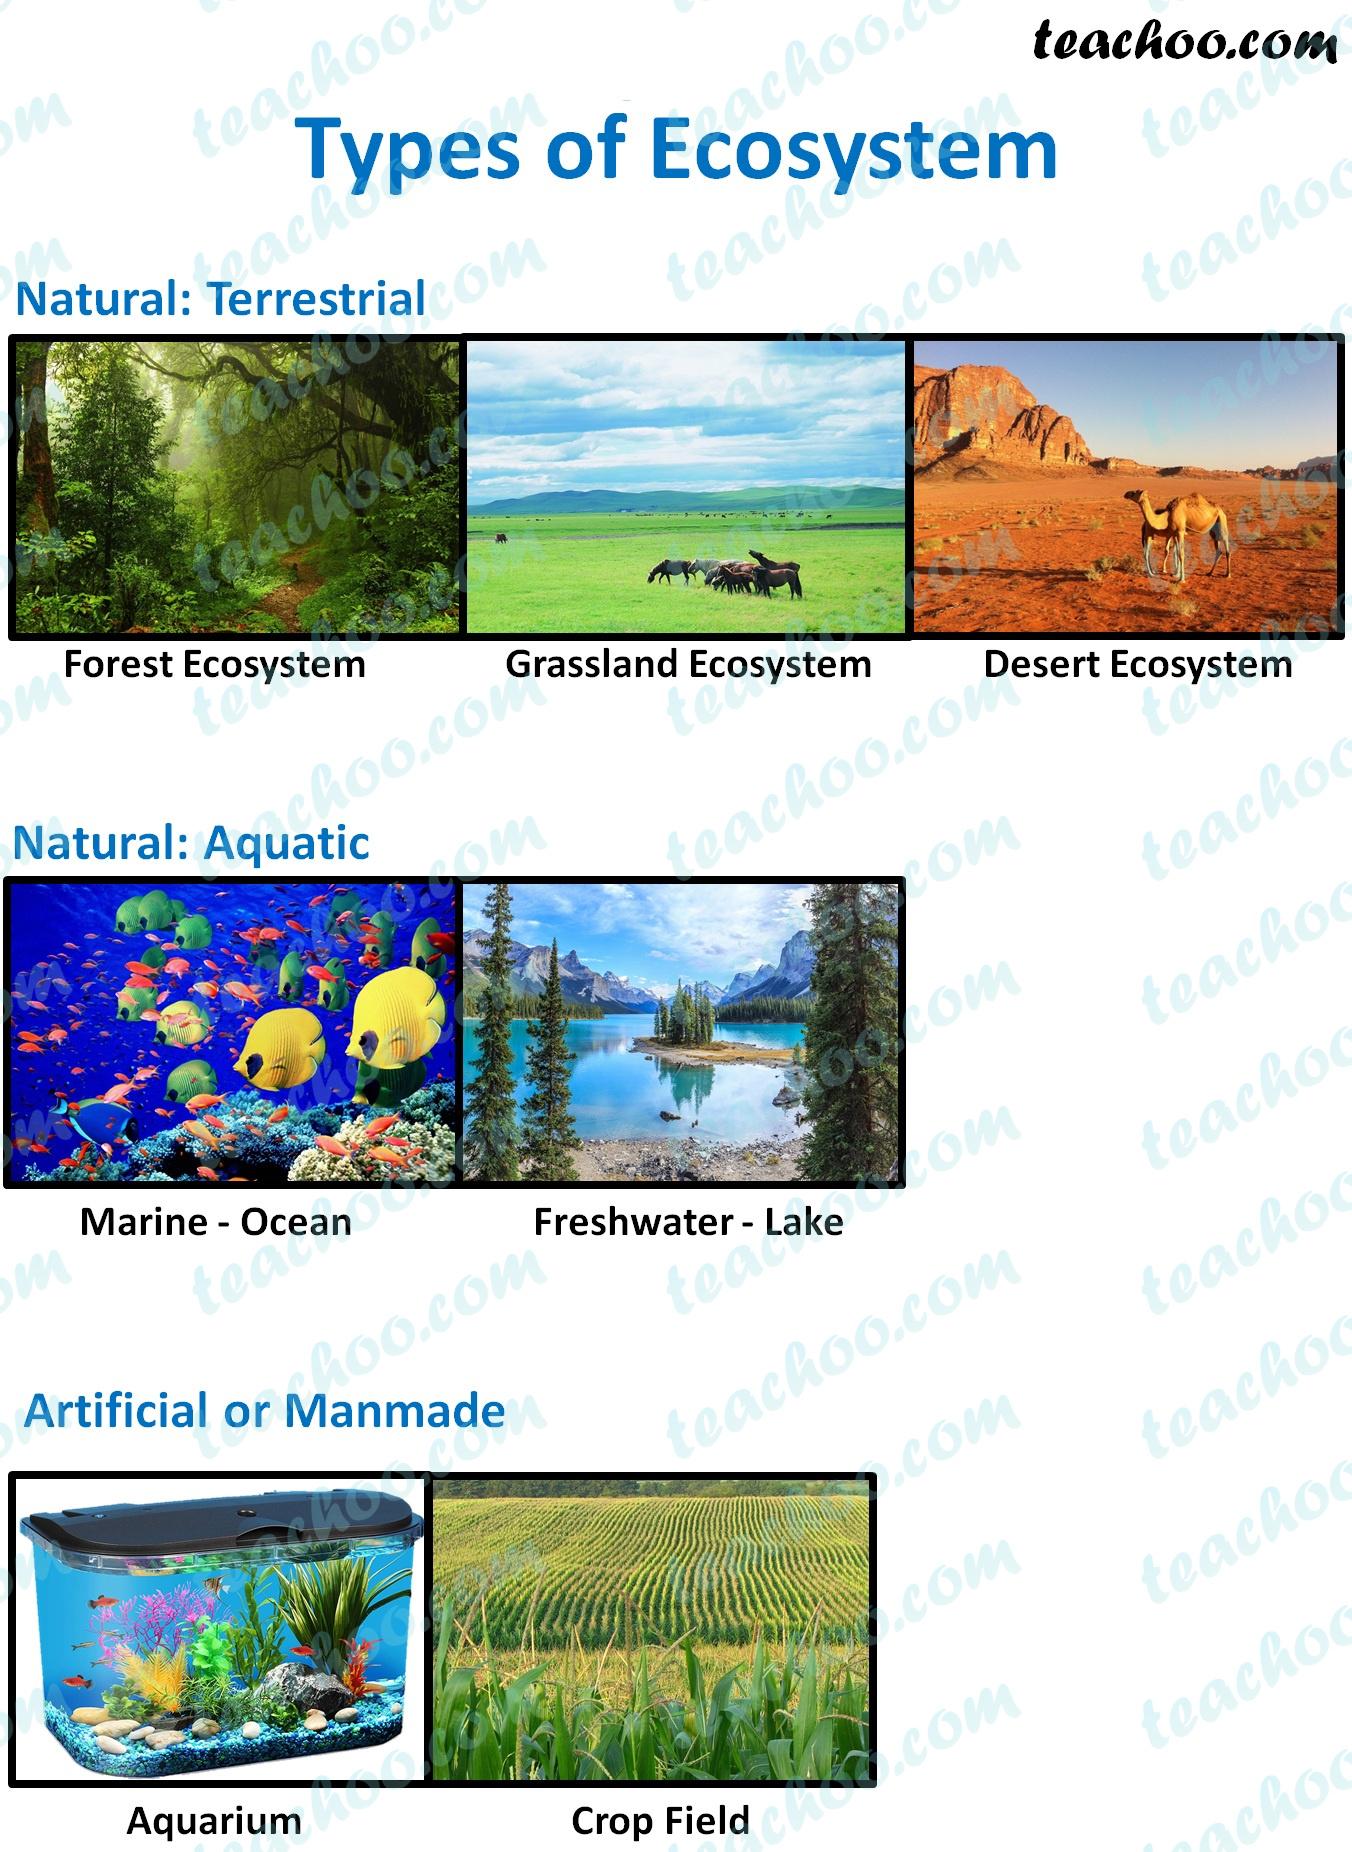 types-of-ecosystem---teachoo.jpg